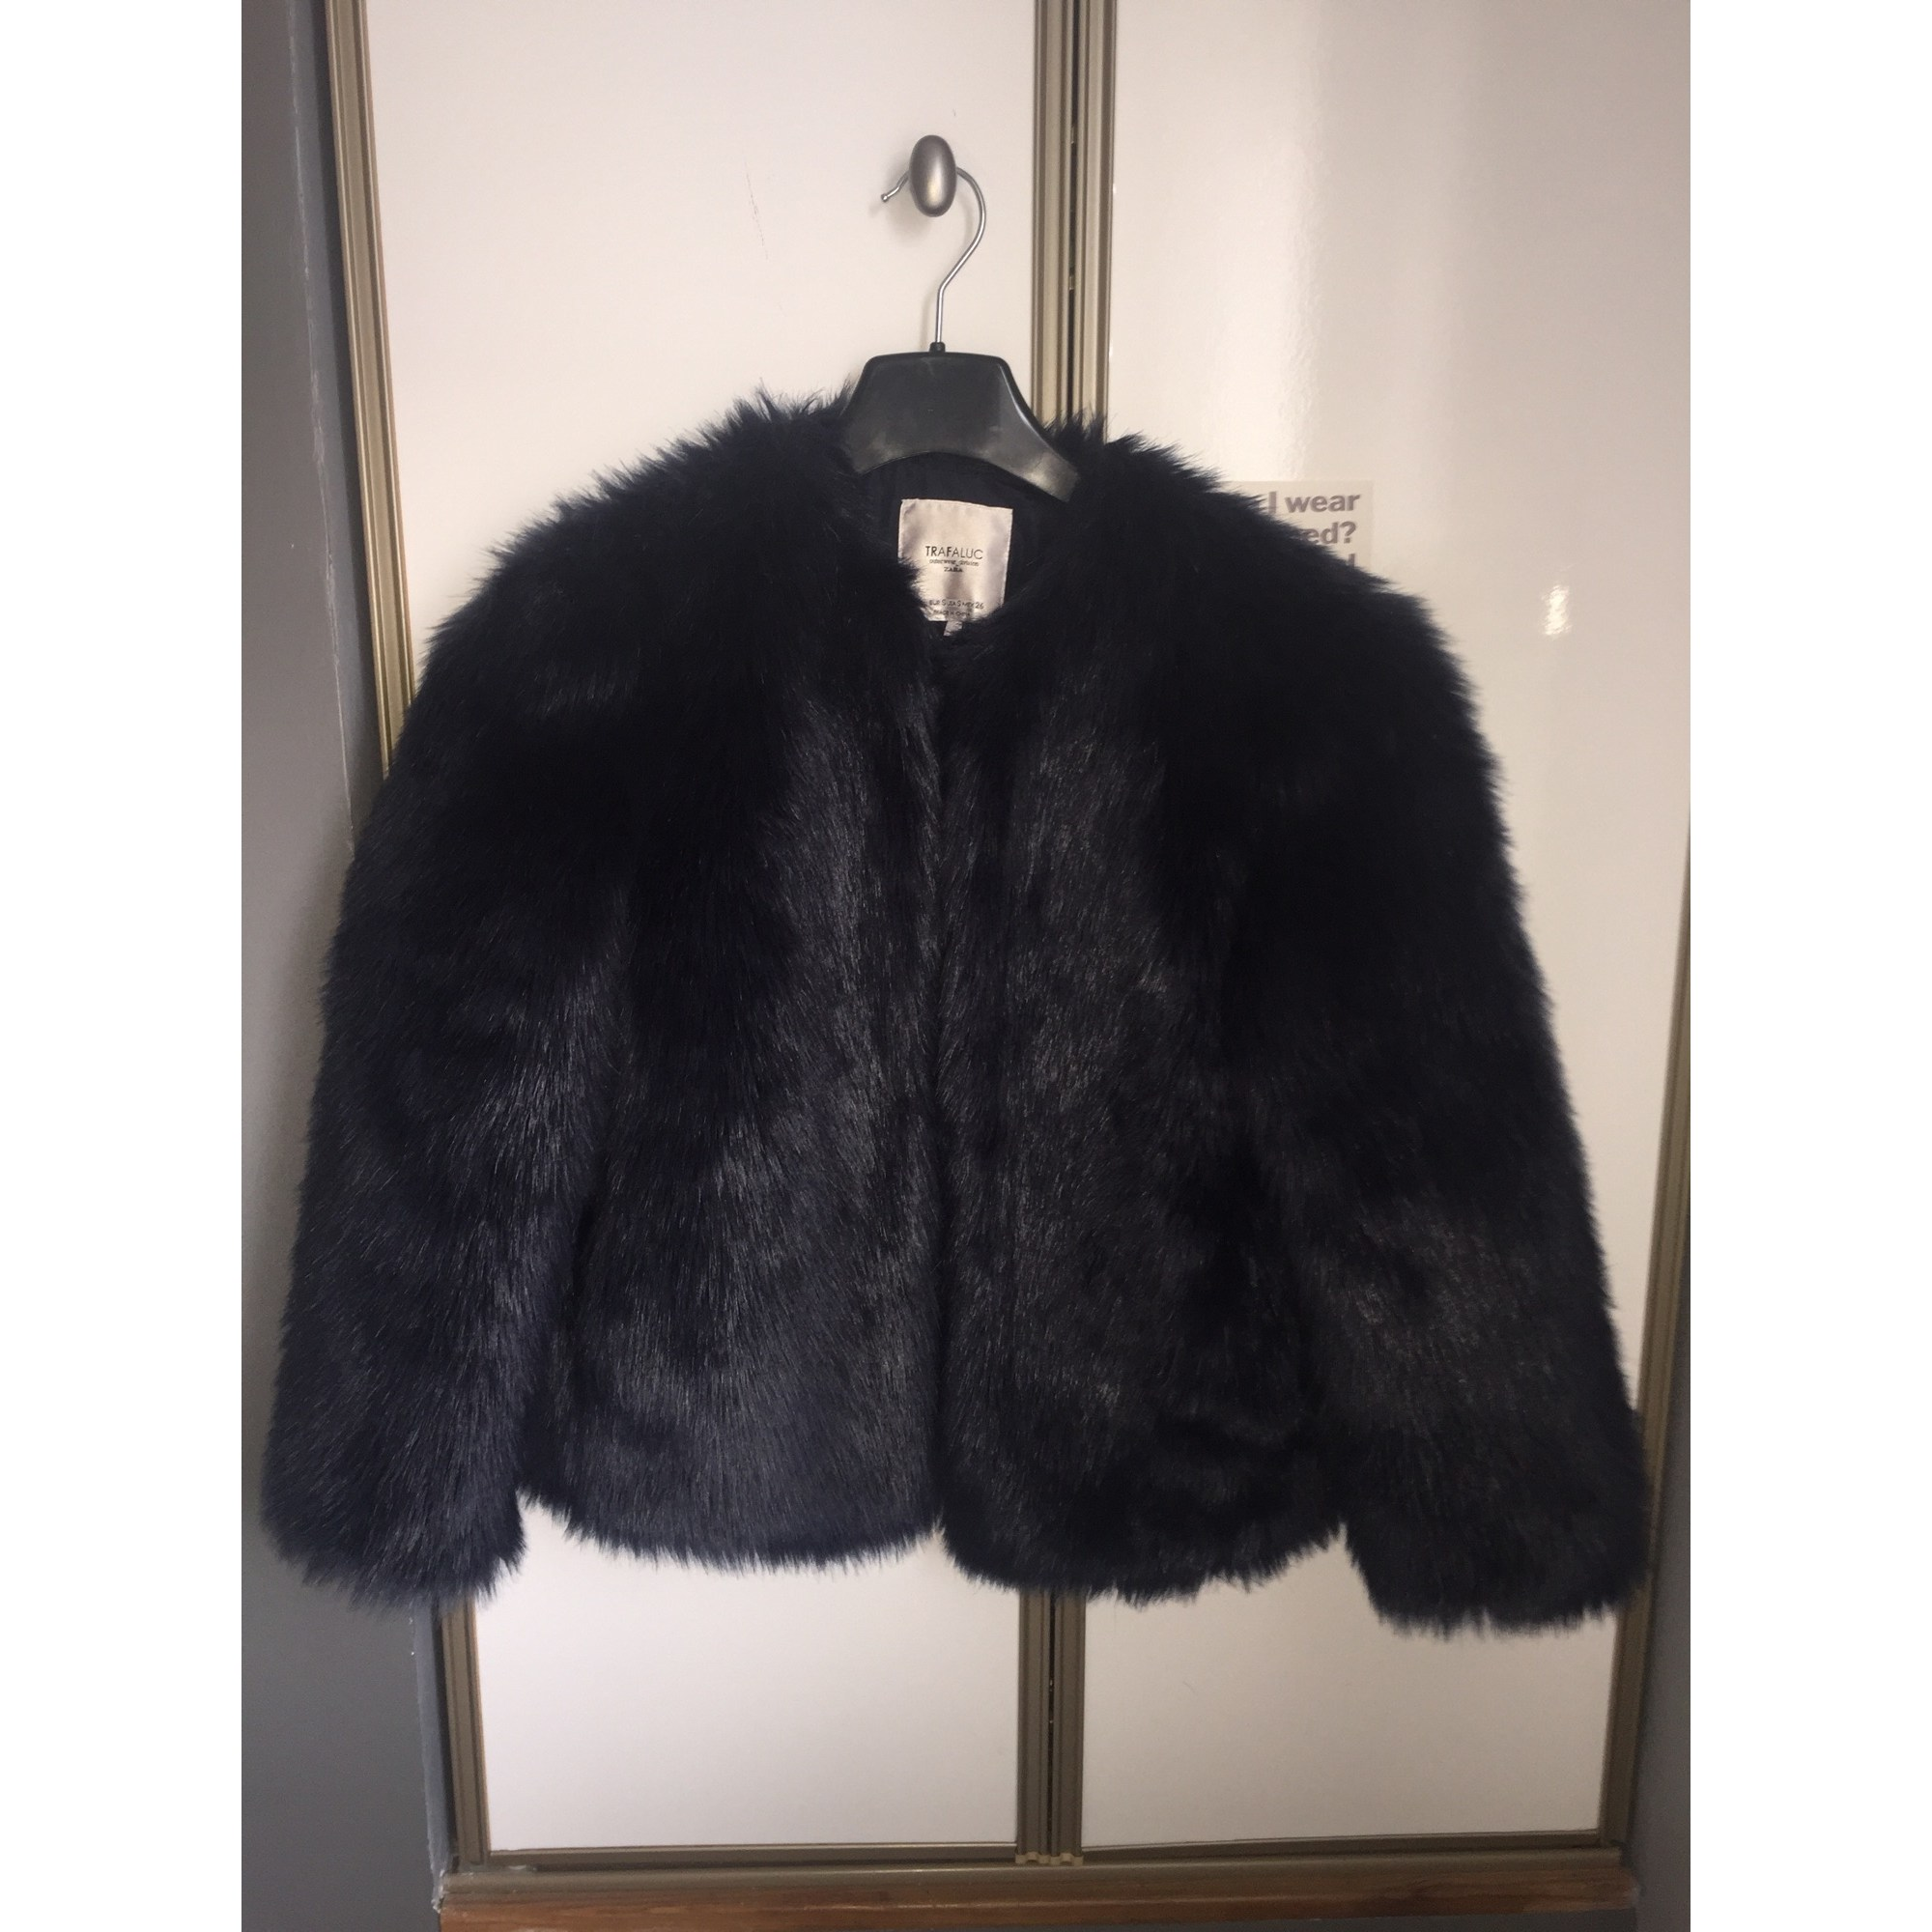 s 36 En Fourrure T1 Lnaolvr Veste Blouson Zara Vendu Bleu Par 4nXIqp